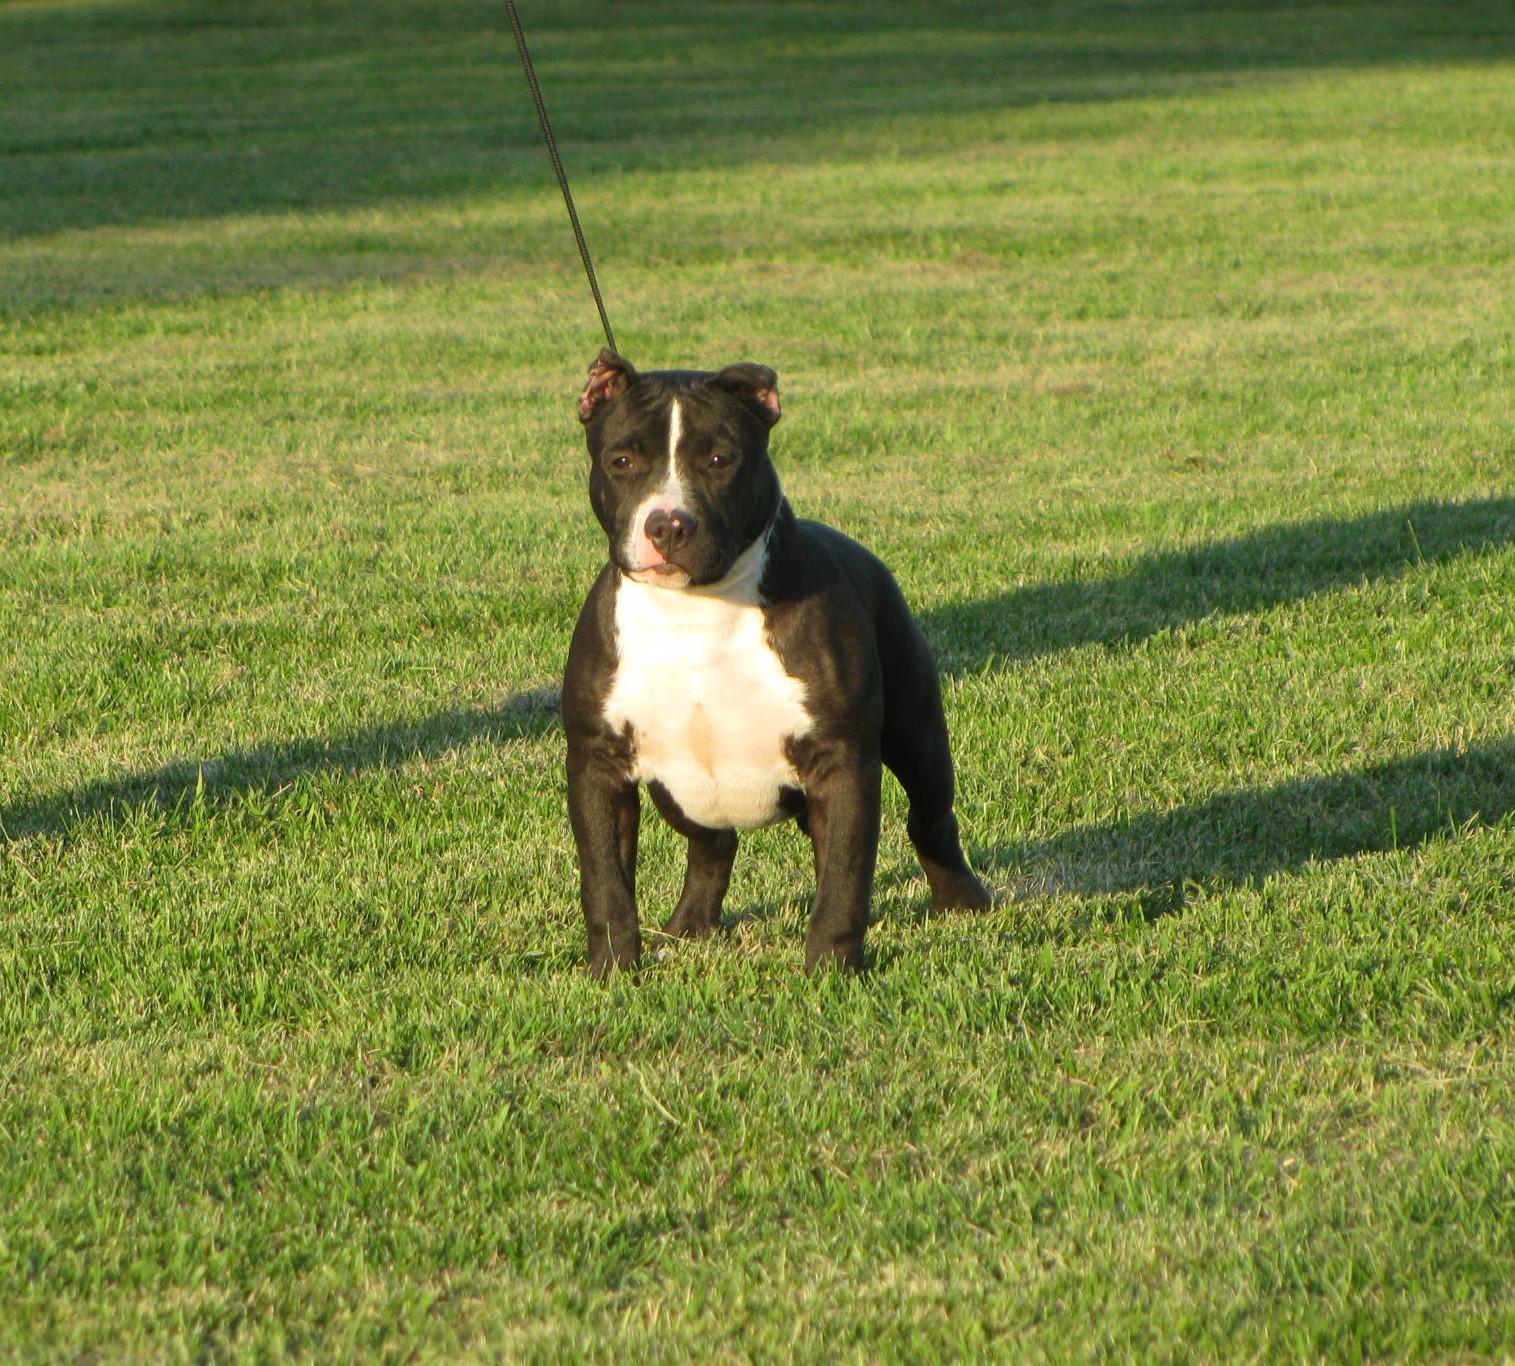 Bully Gotti Pitbull Puppy For Sale Bully Pit For Sale Steelhead